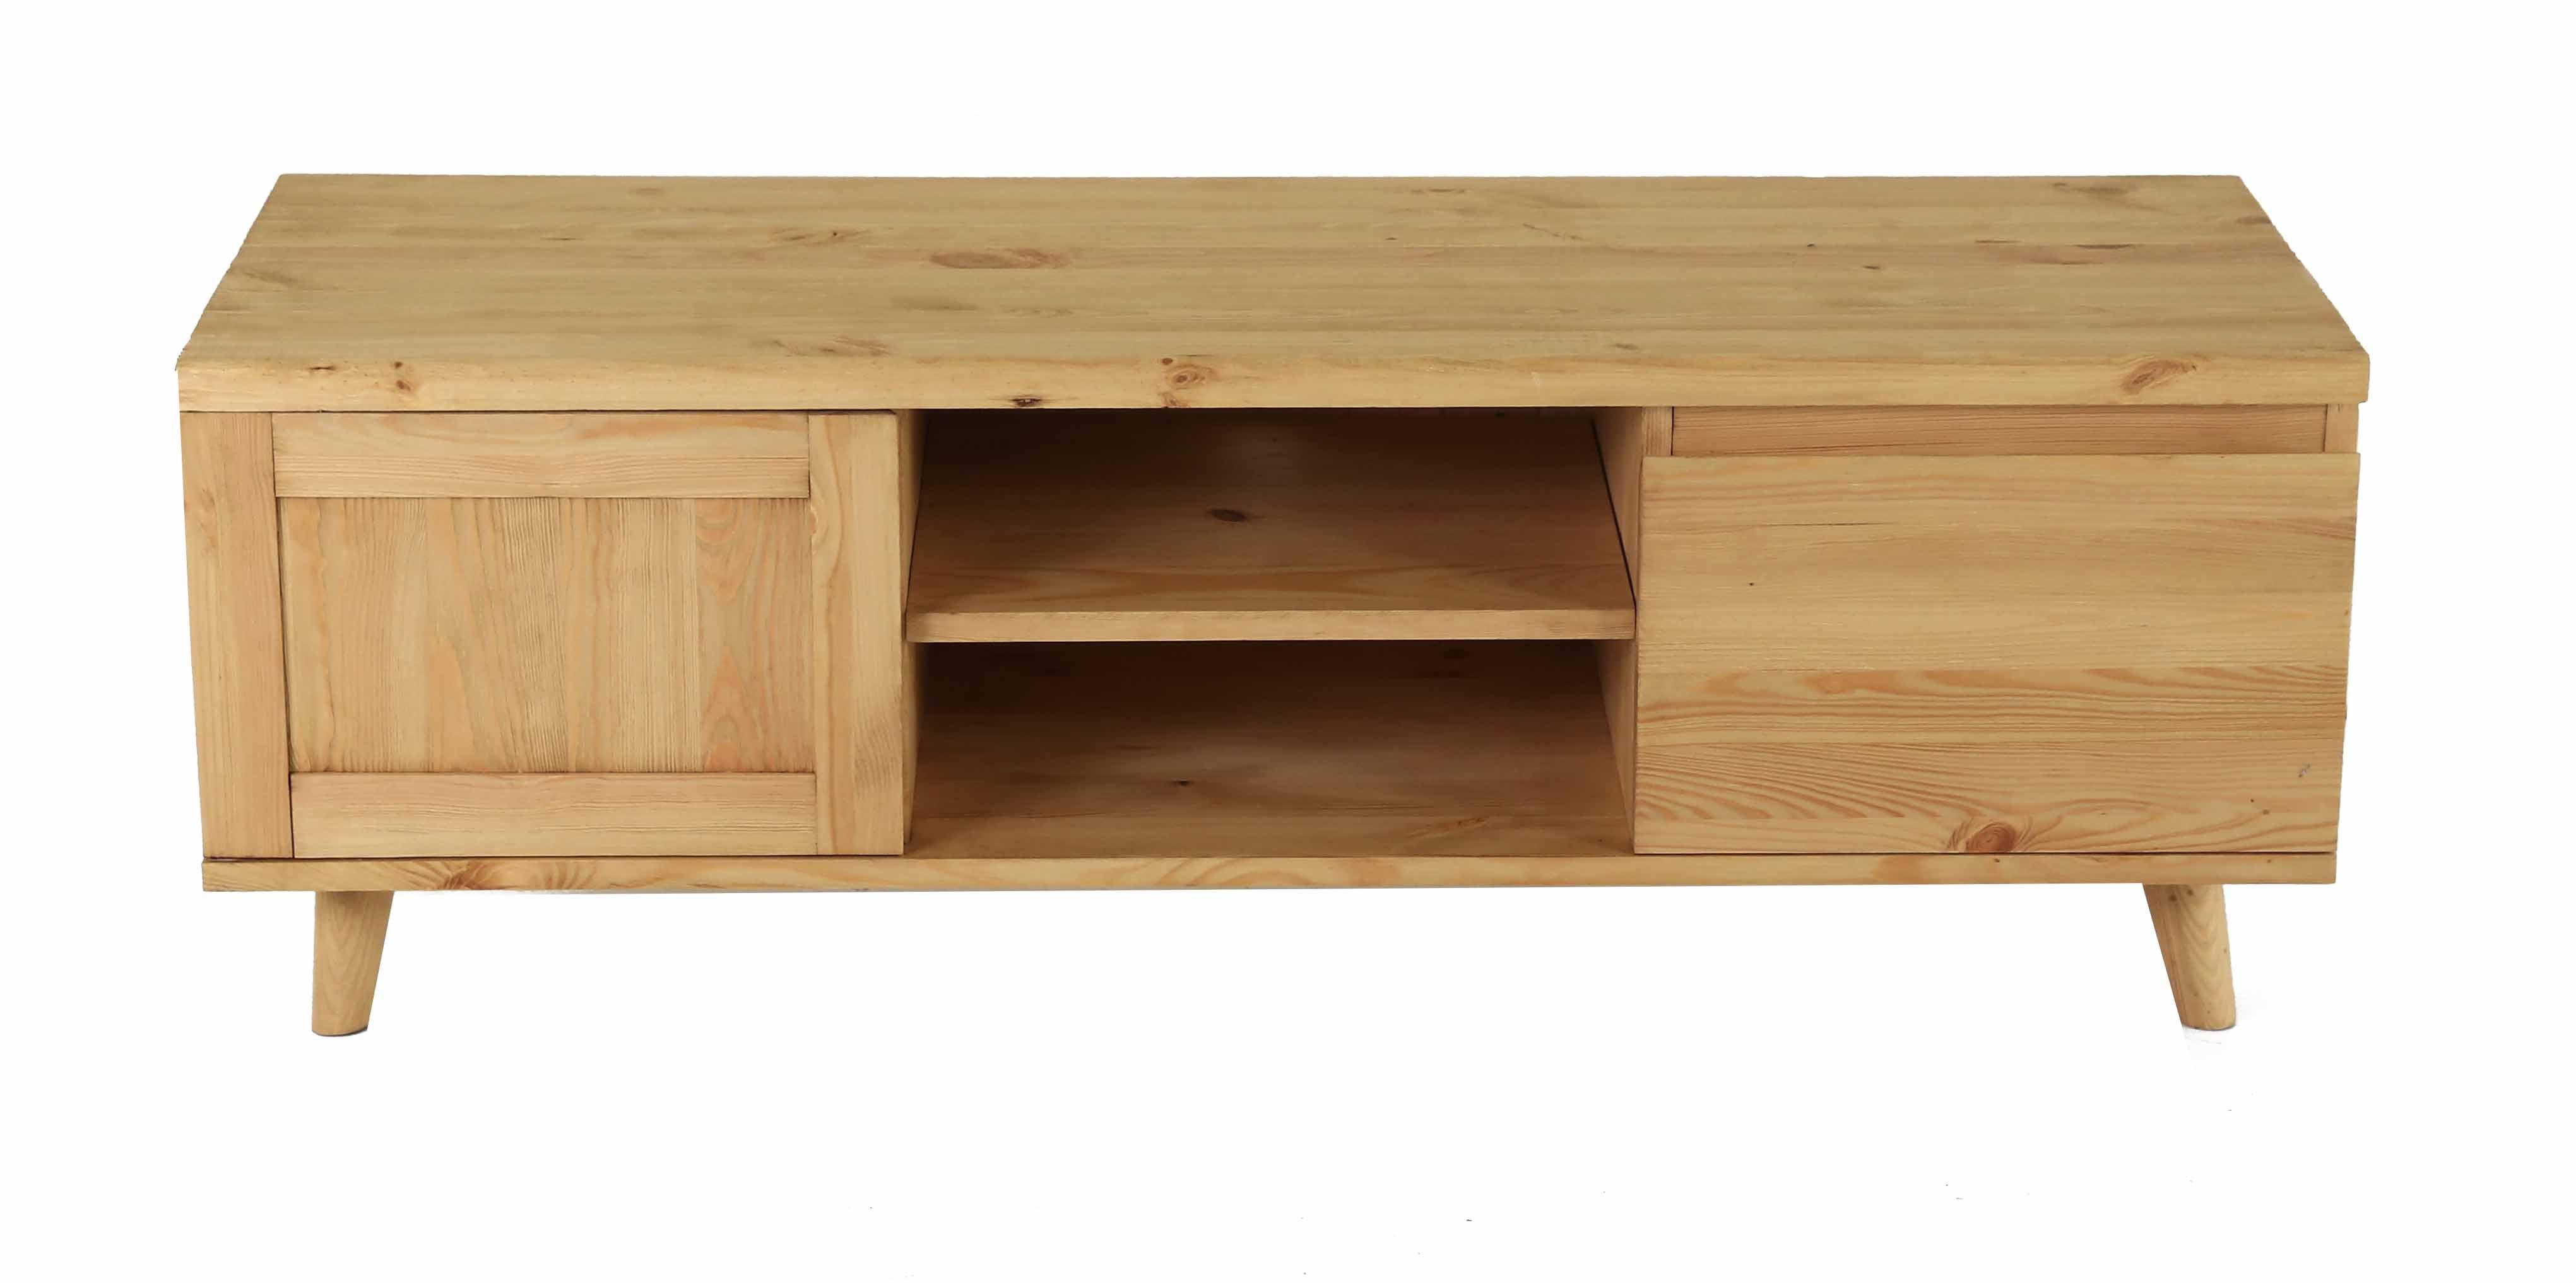 couleurs meuble tv pin massif 1 porte 1 tiroir rewind de. Black Bedroom Furniture Sets. Home Design Ideas